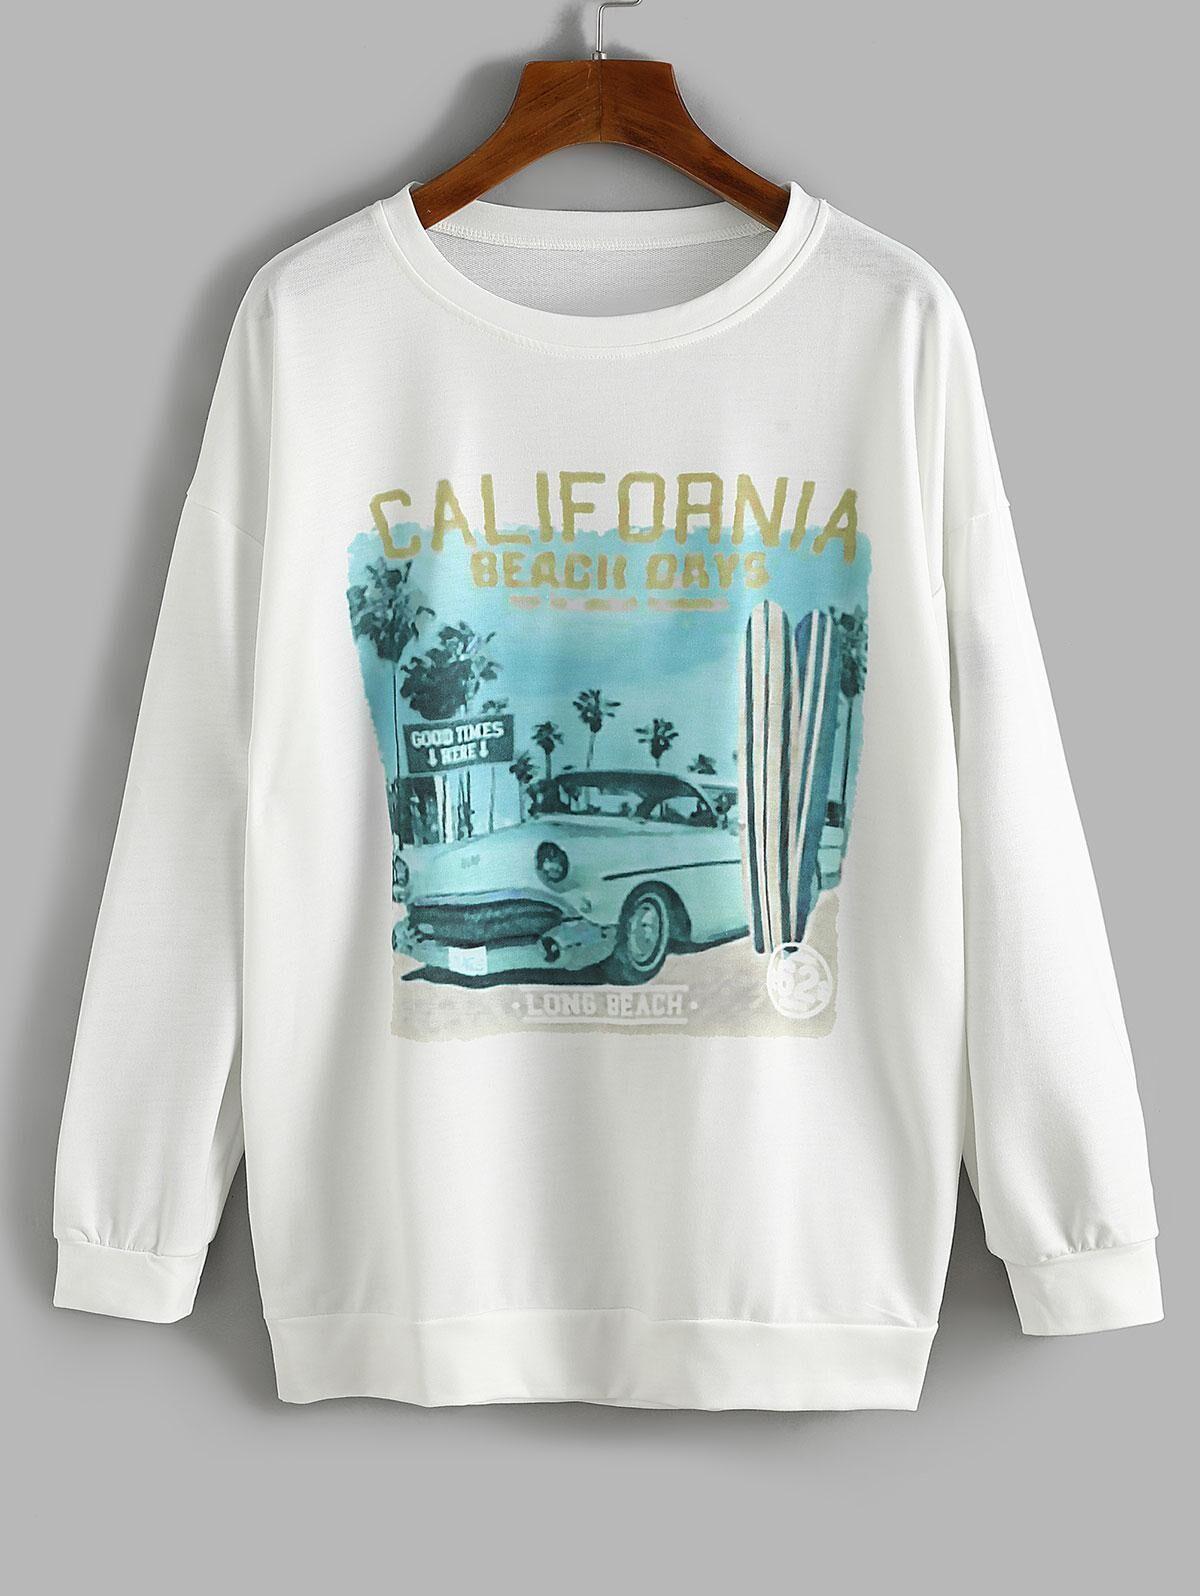 Oversize Car CALIFORNIA Graphic Sweatshirt in WHITE - Size: Medium